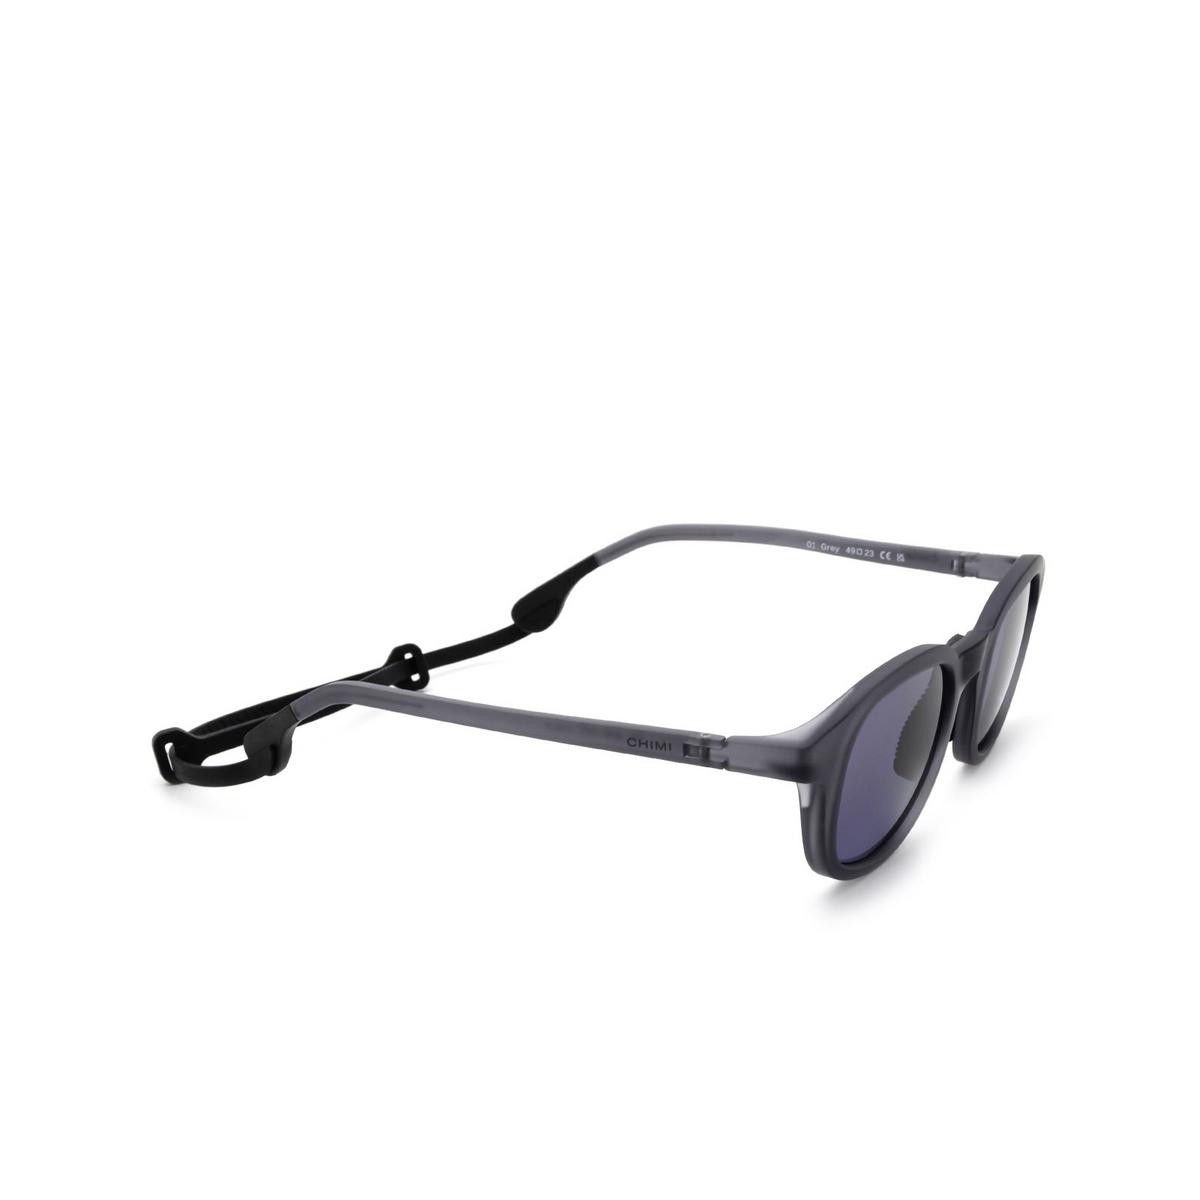 Chimi® Square Sunglasses: 01 ACTIVE color Grey - three-quarters view.